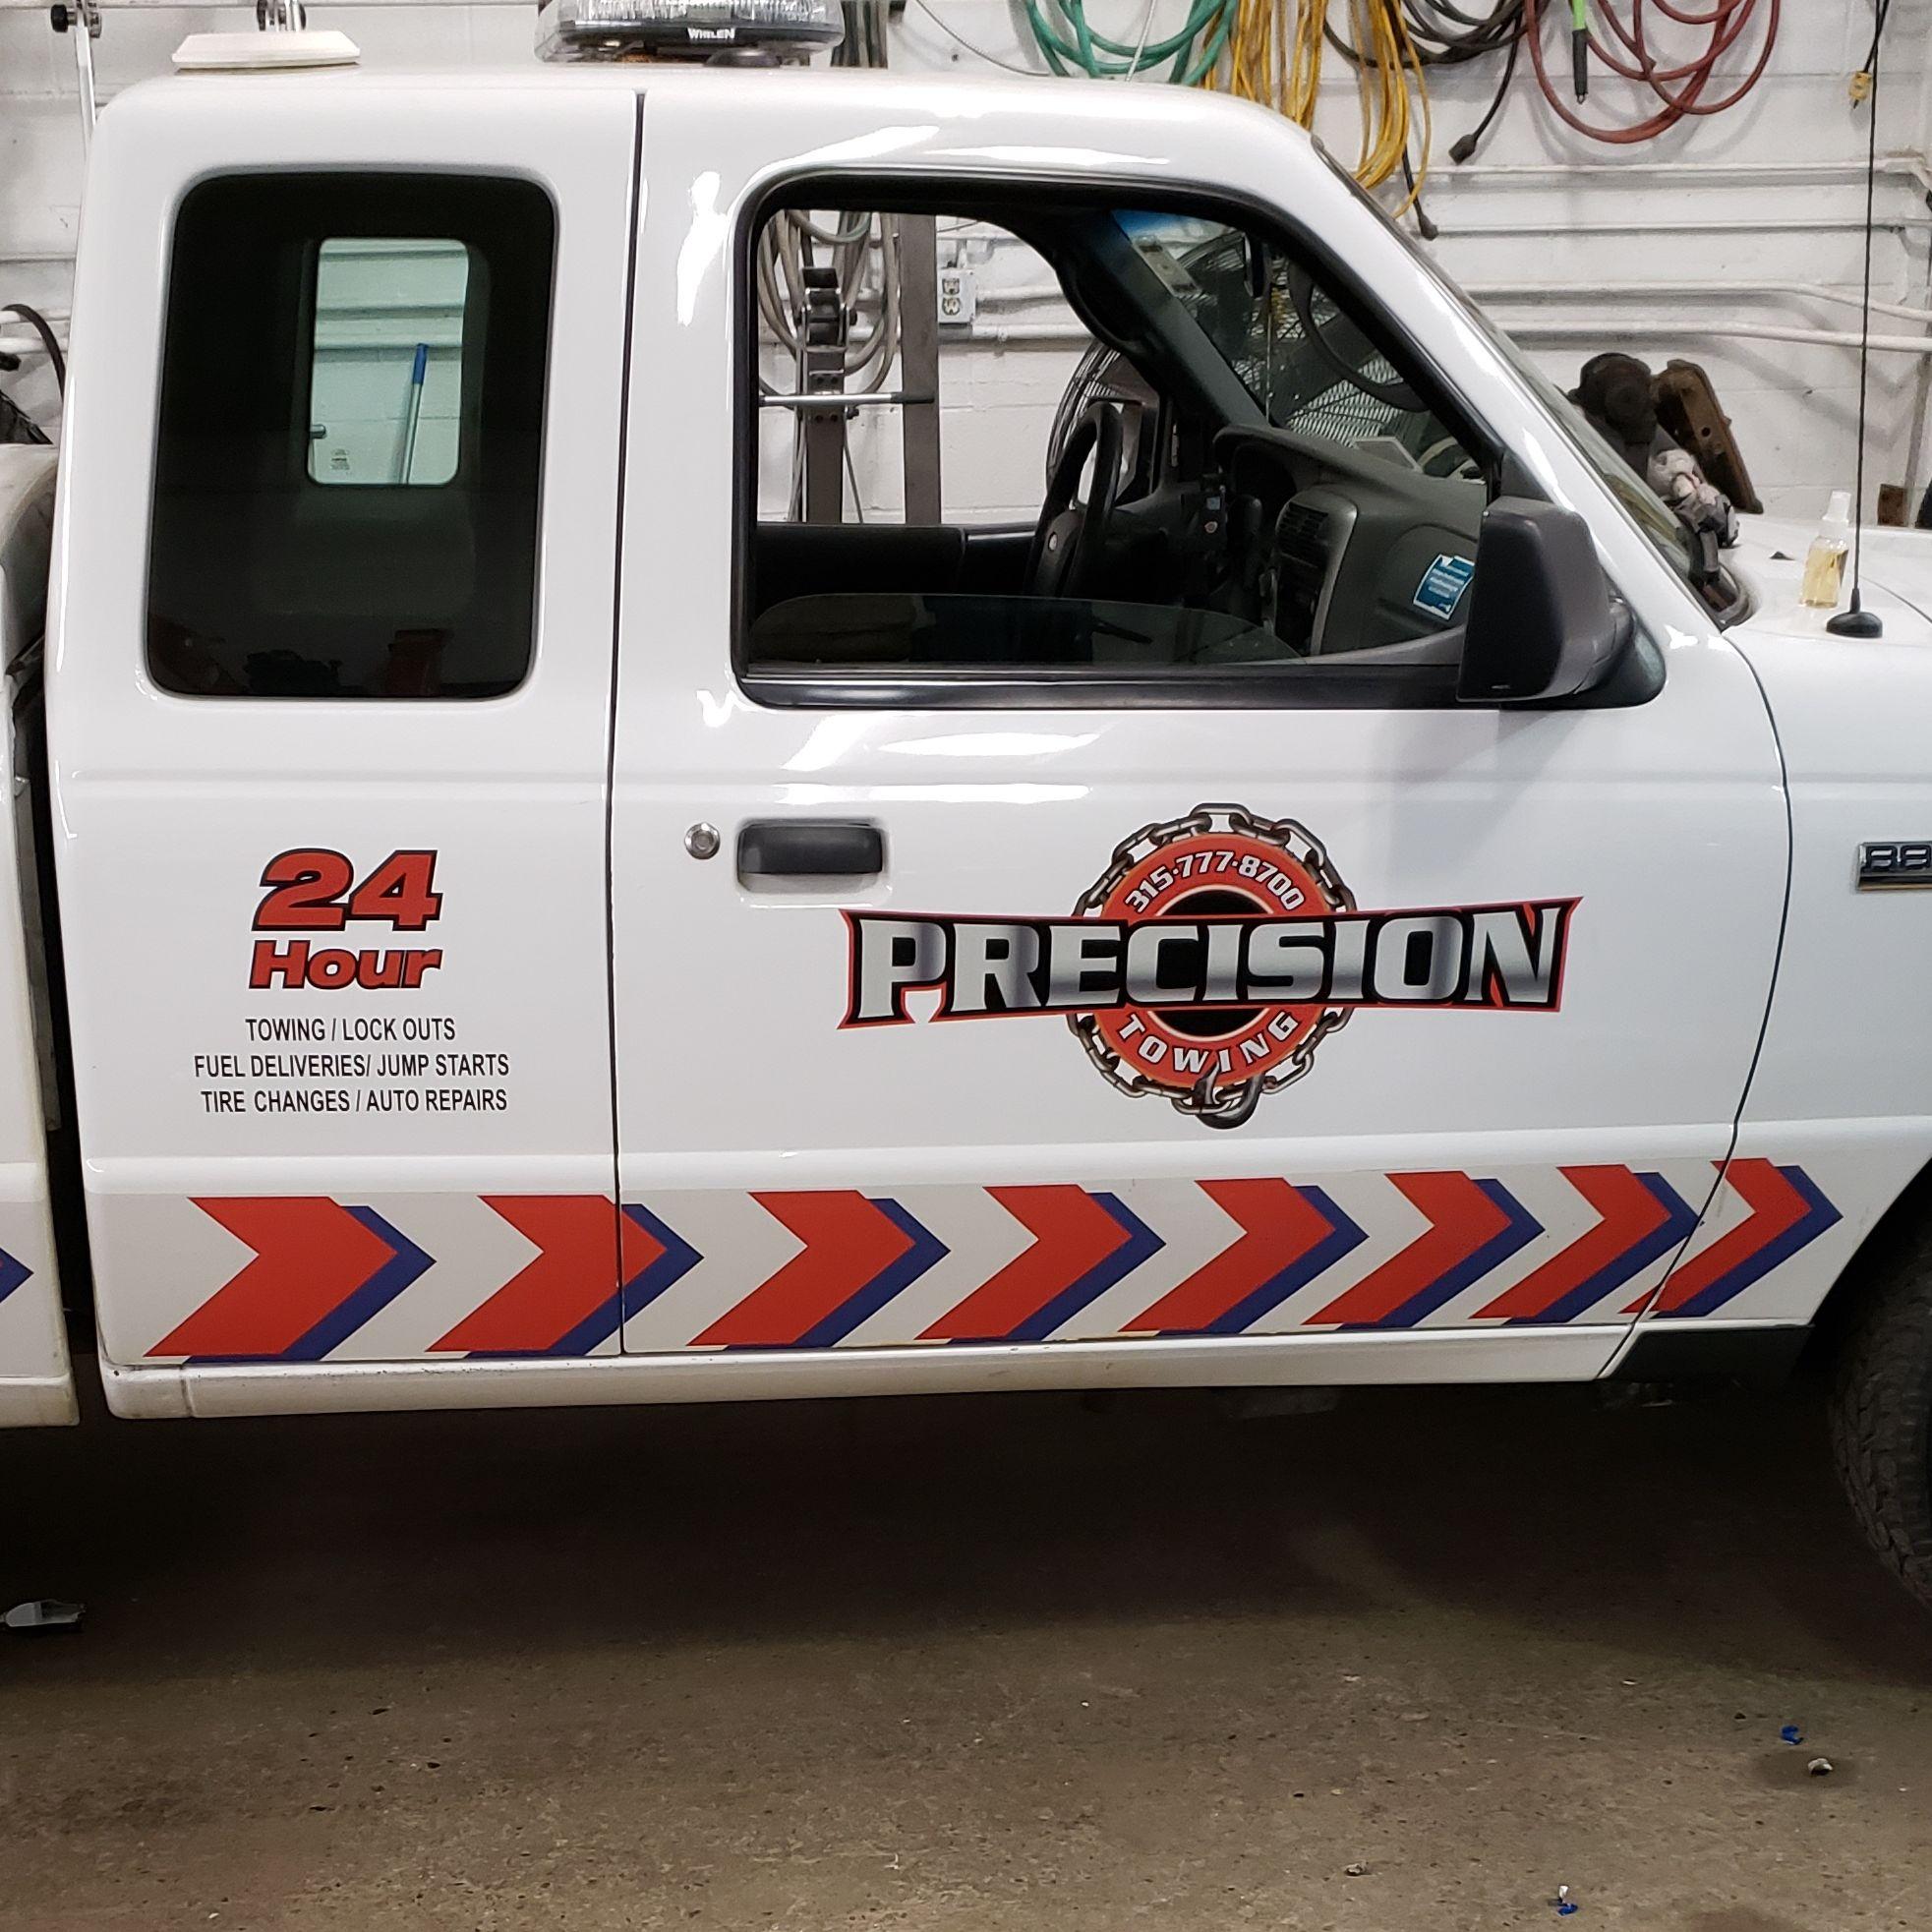 Precision Towing & Auto Worx